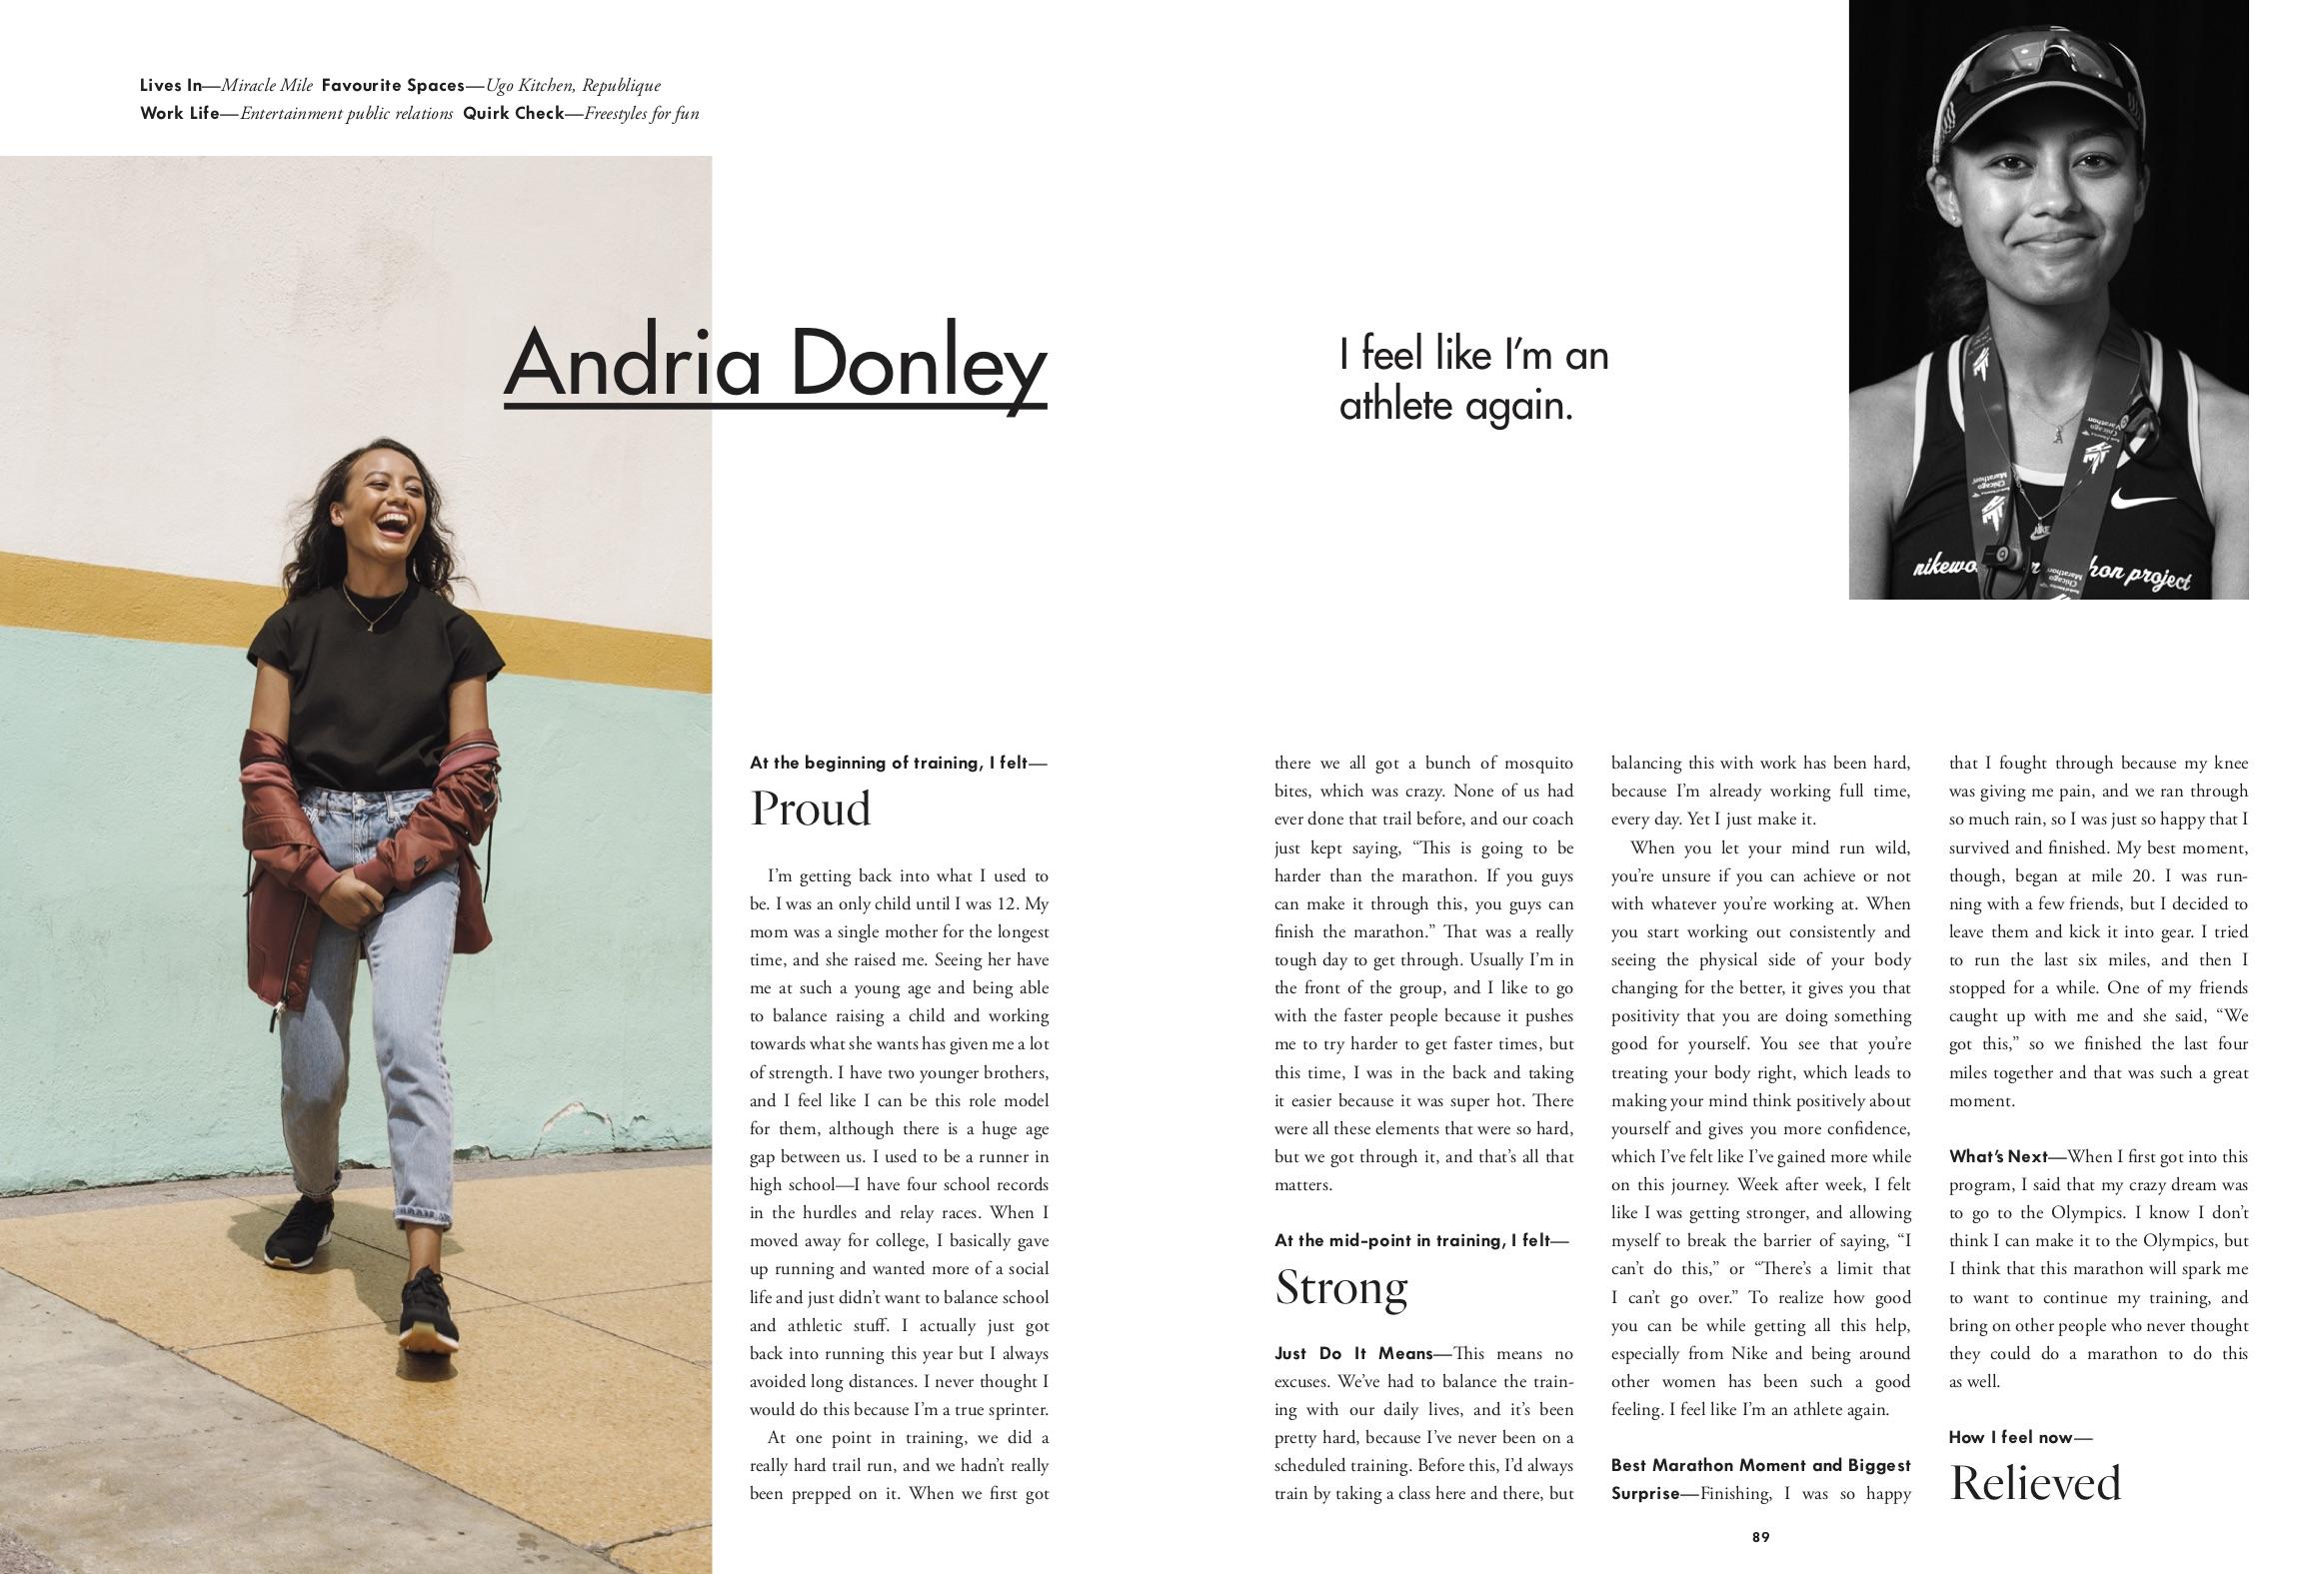 8 NikeXDarling-Landscape-Andria-Donley.jpg